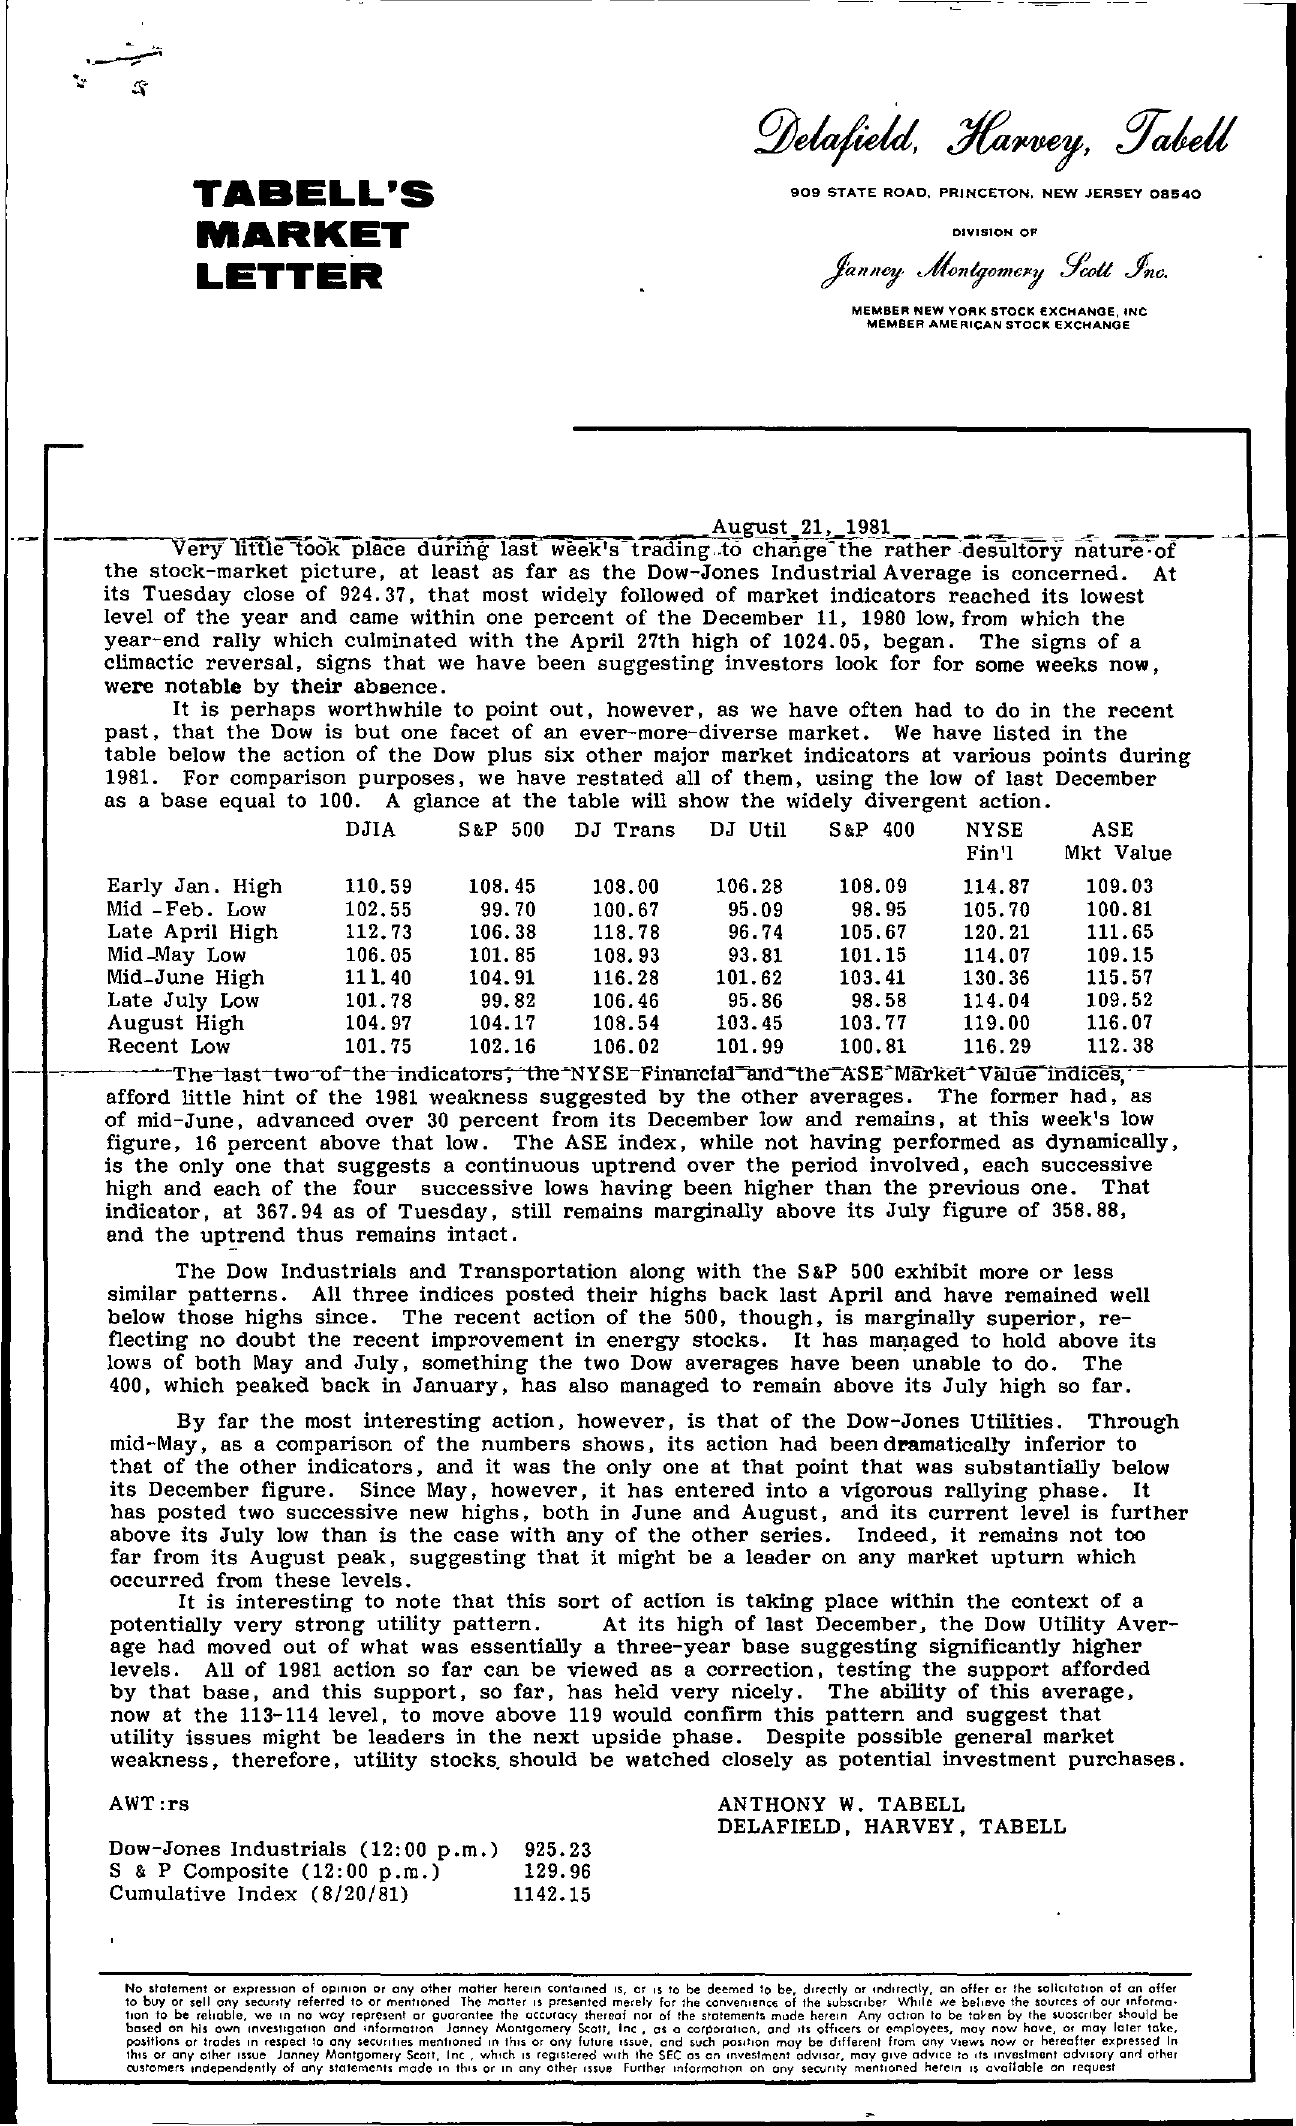 Tabell's Market Letter - August 21, 1981